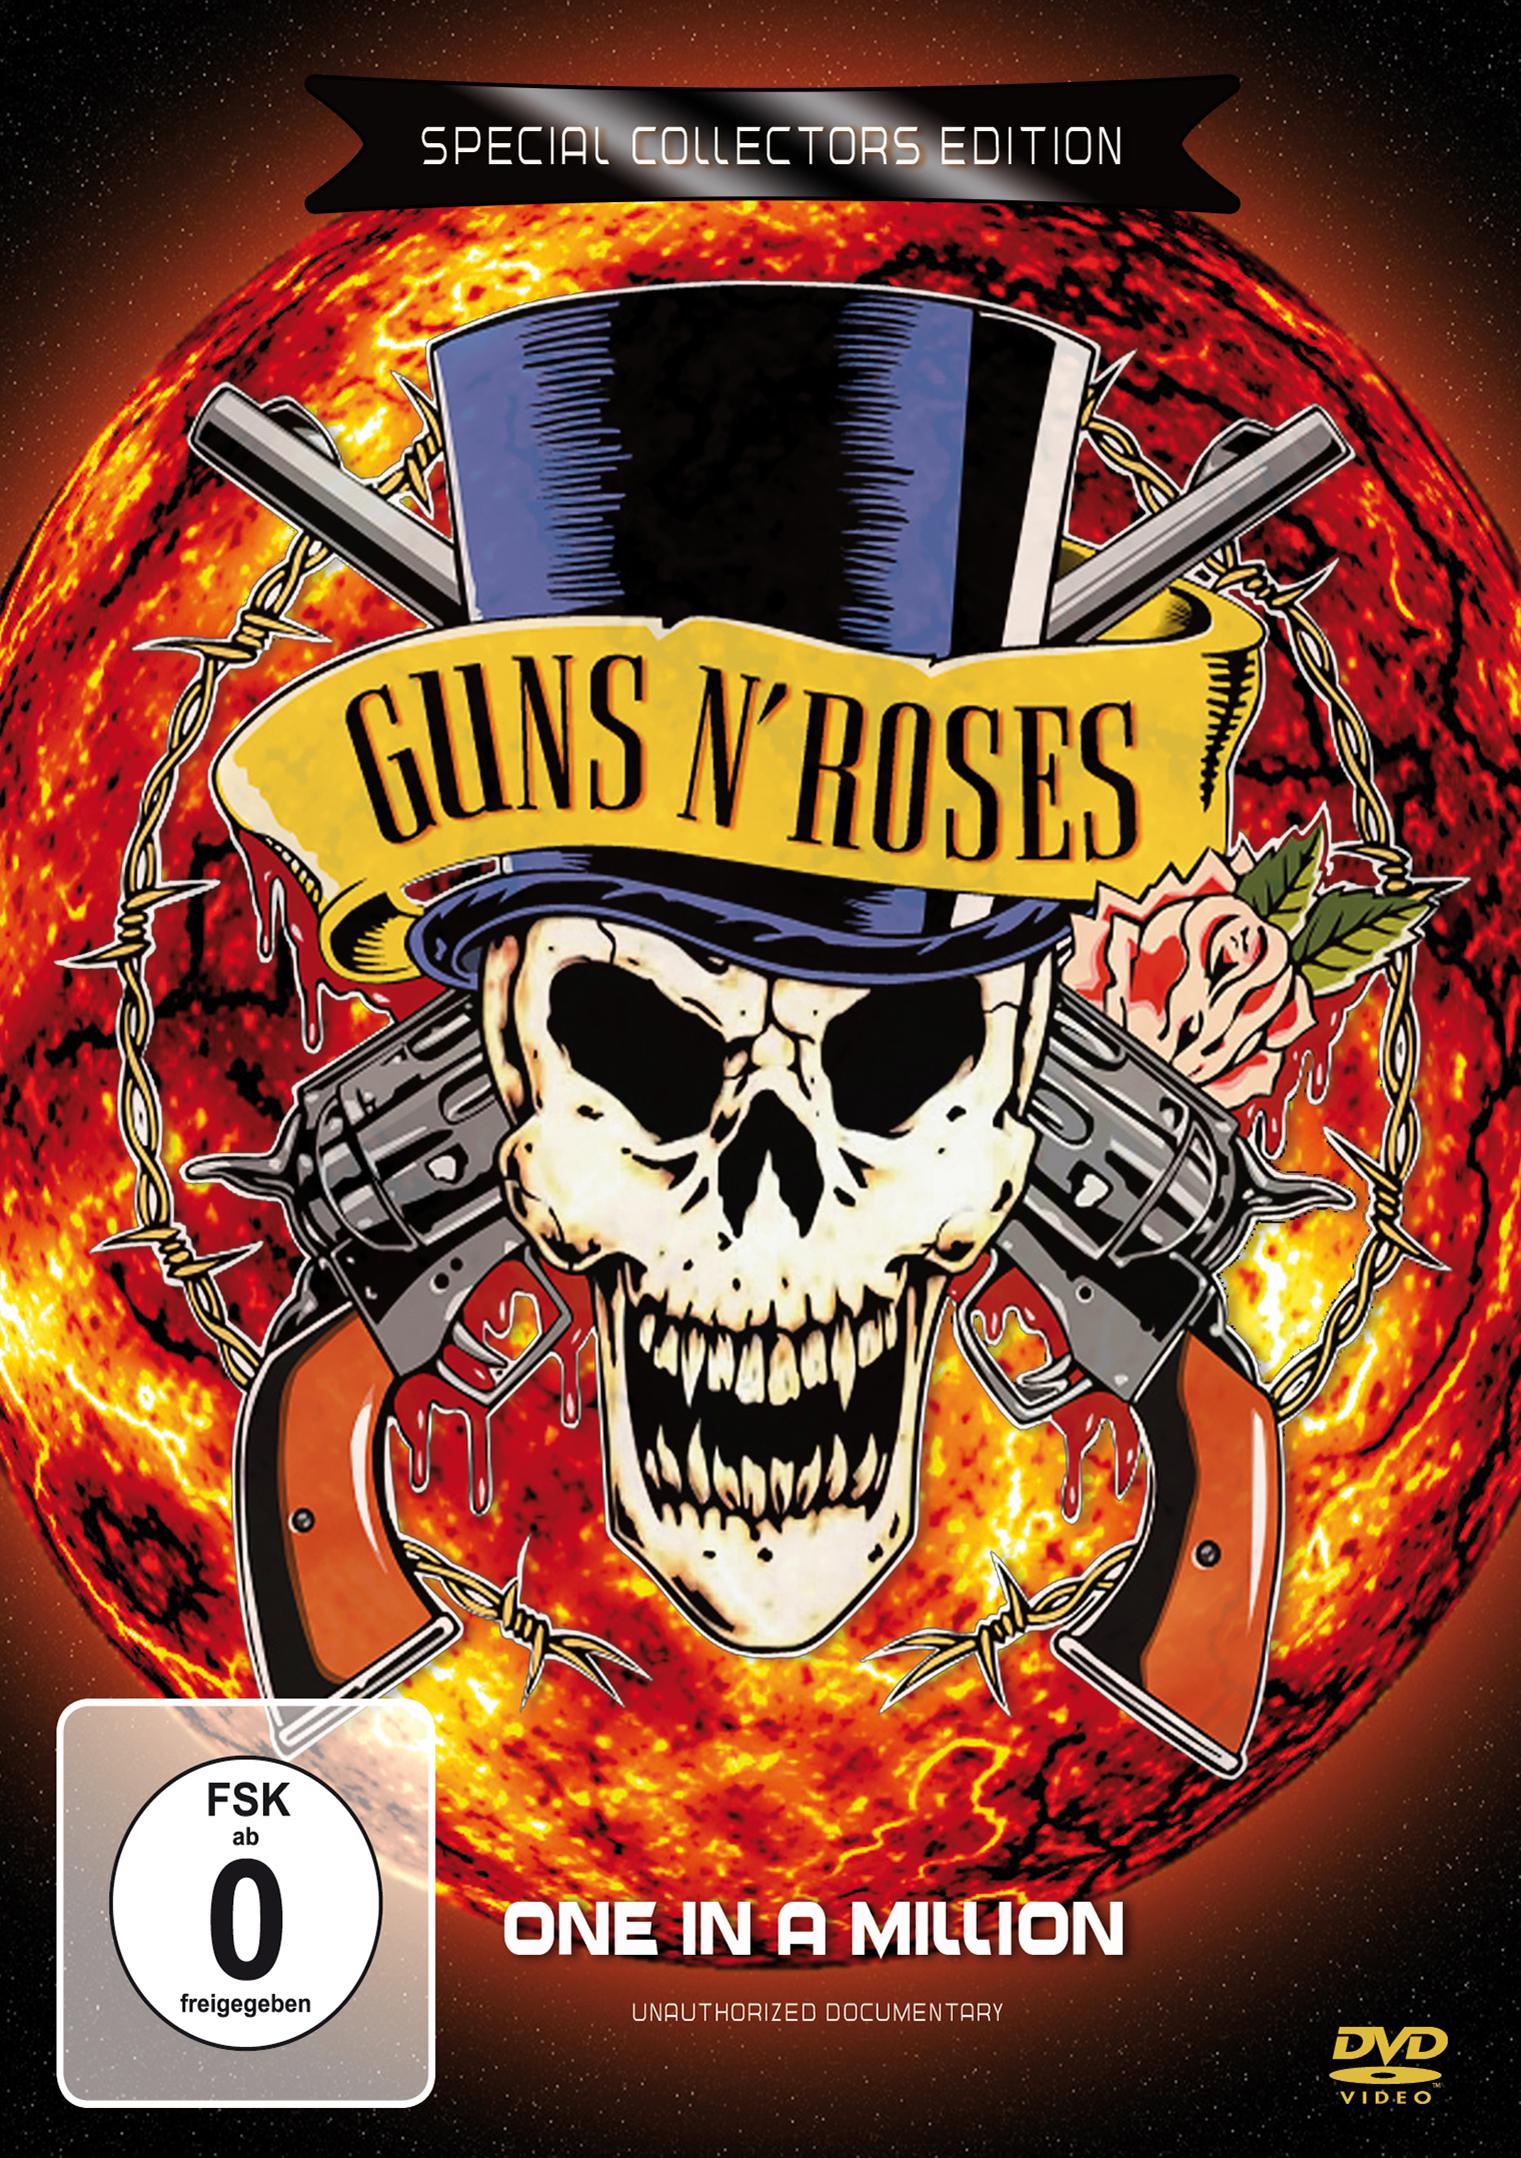 Guns N' Roses: One In a Million